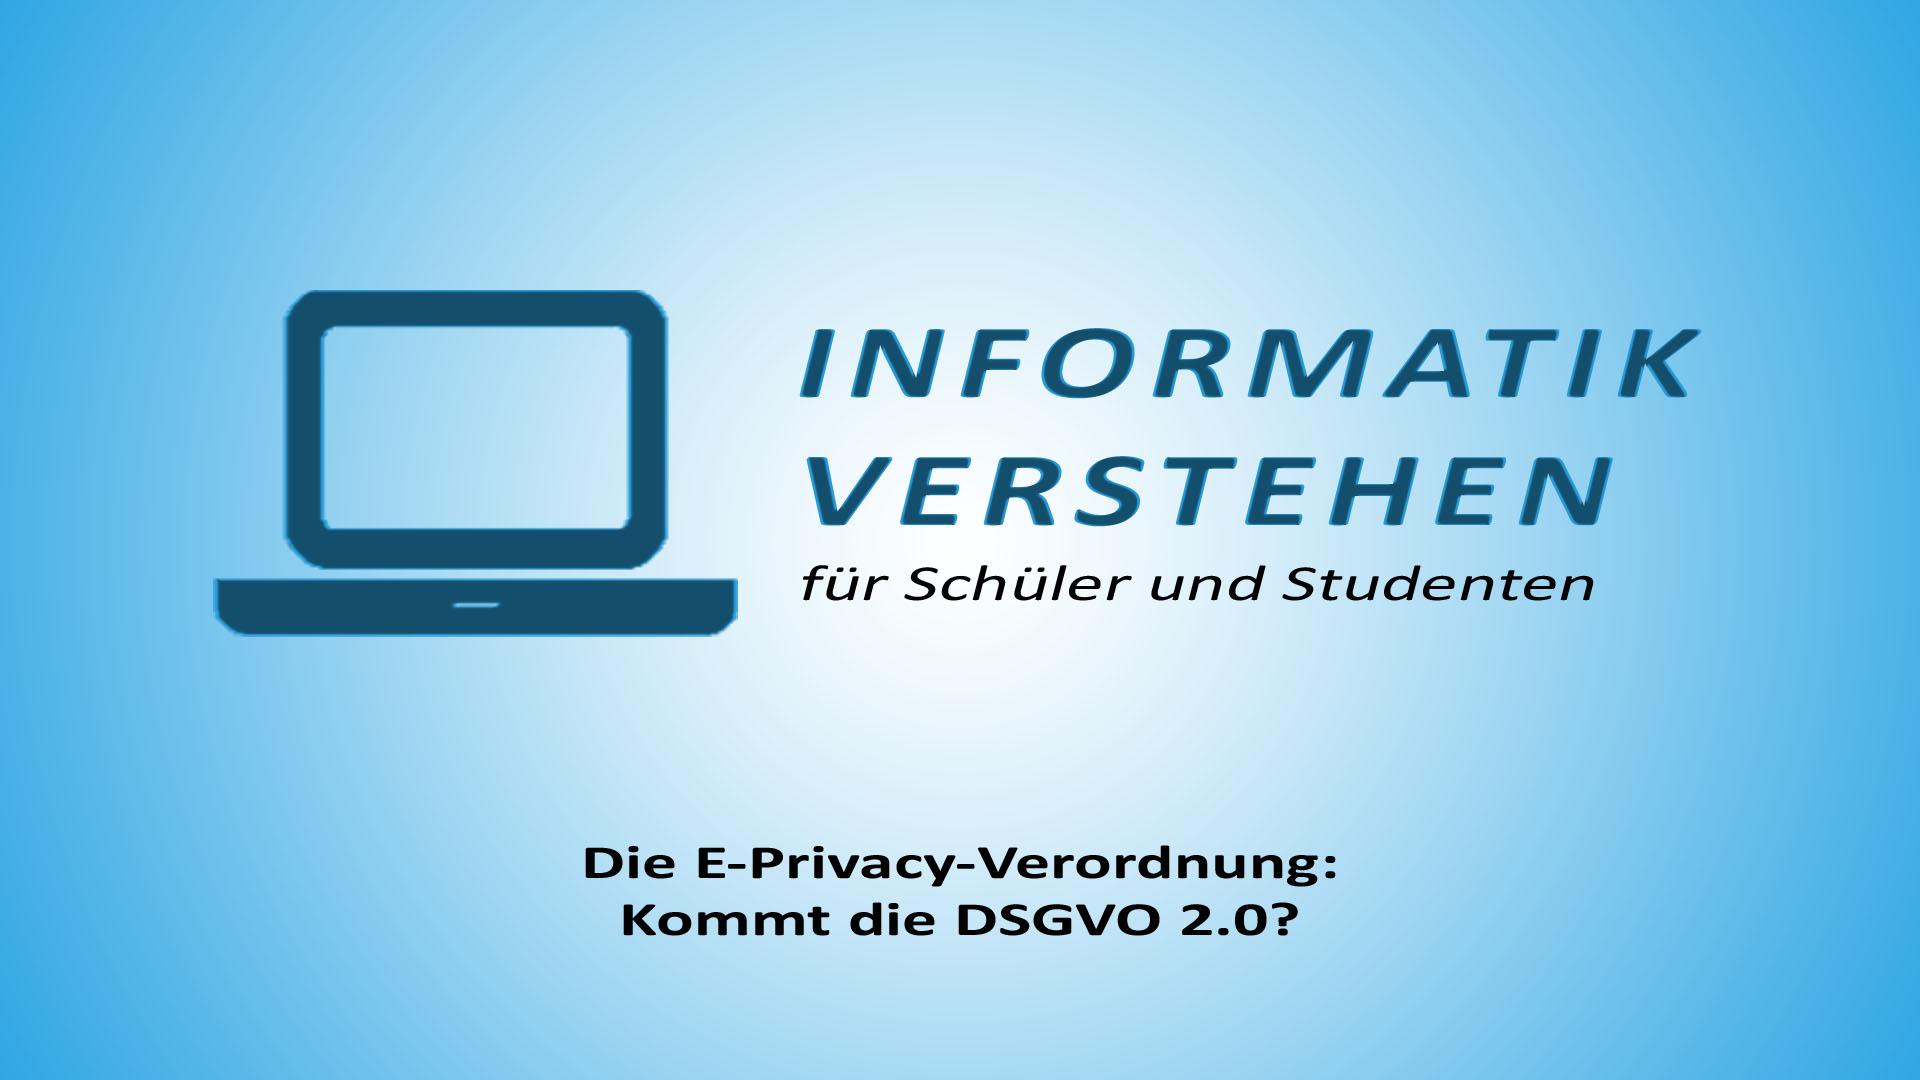 Die E-Privacy-Verordnung: Kommt die DSGVO 2.0? | Informatik Blog